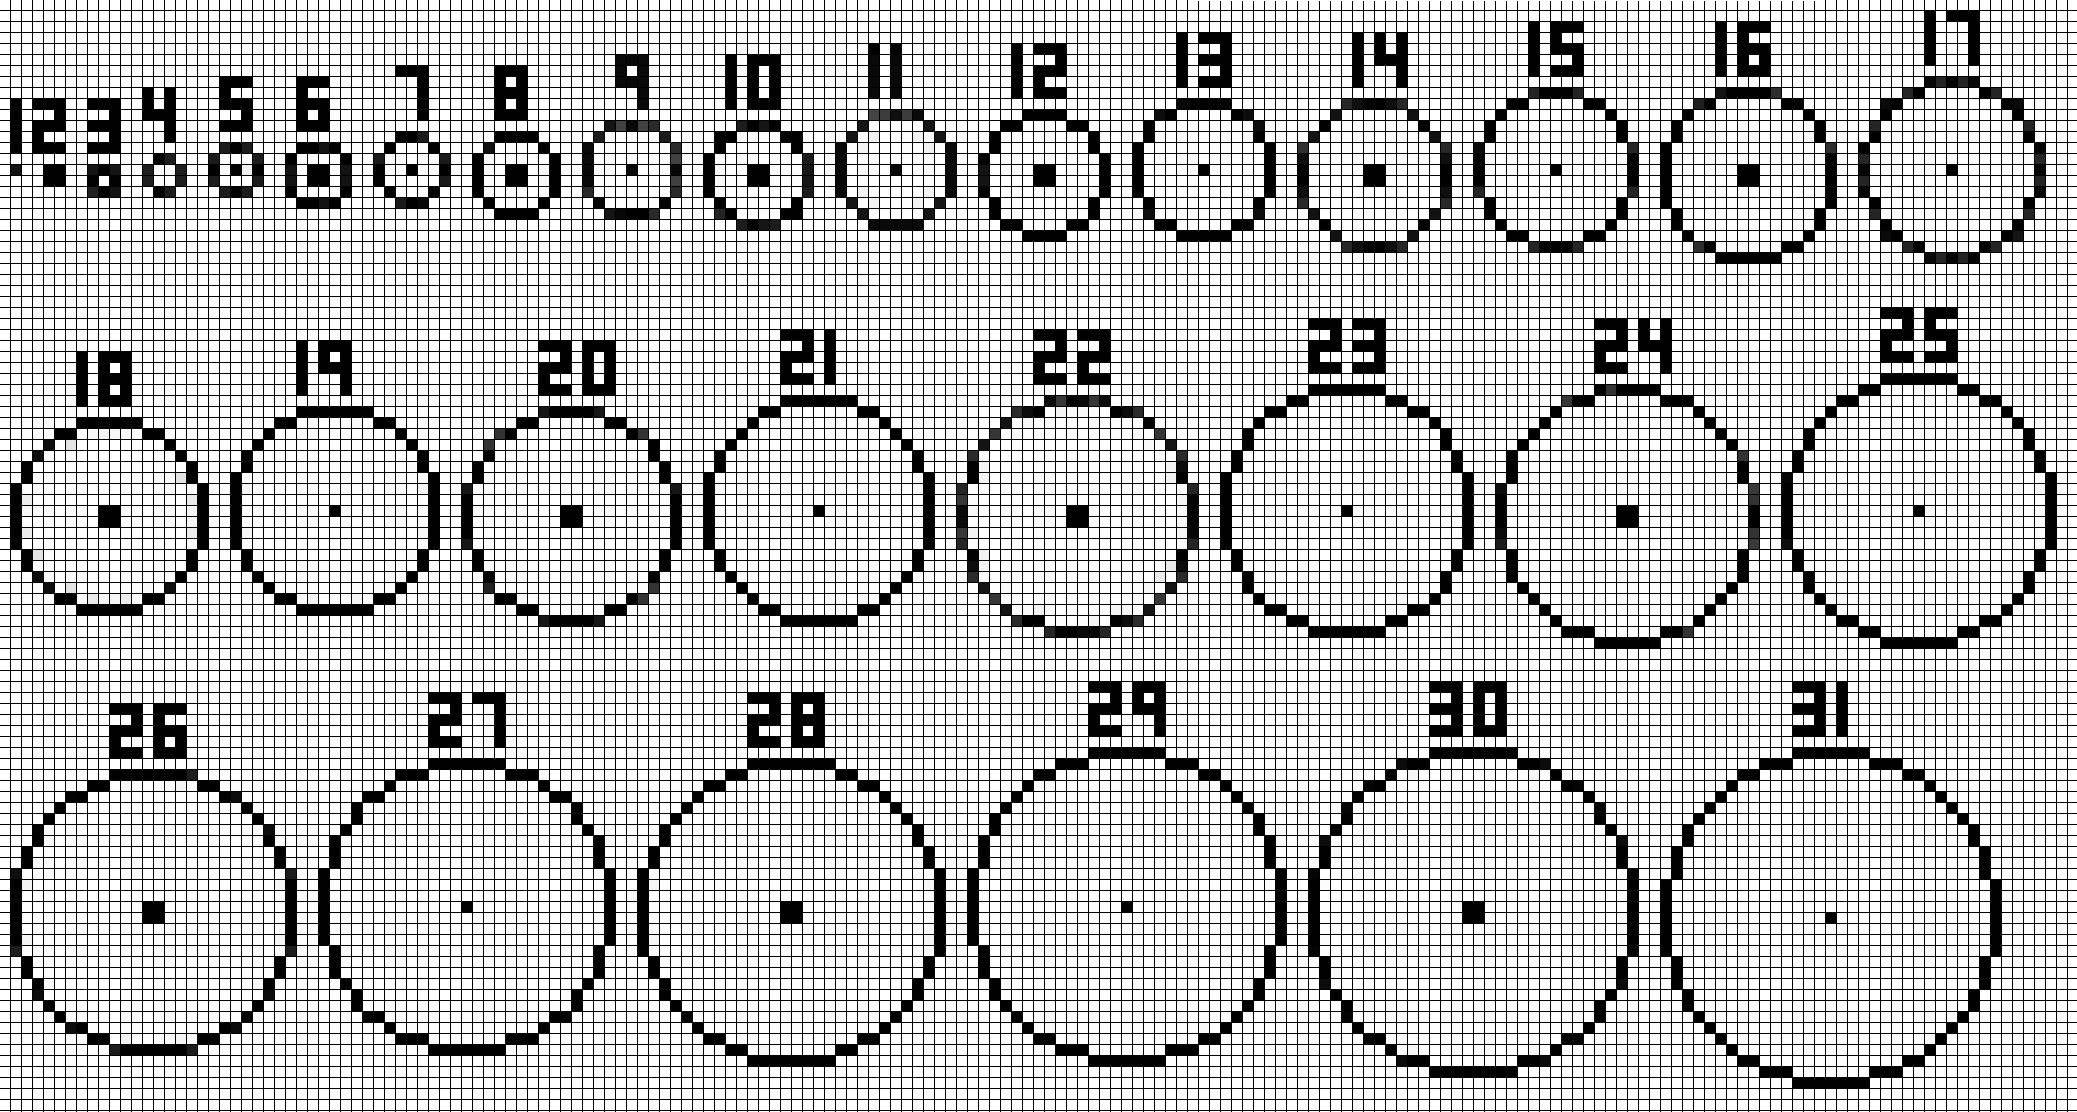 New Circle Guide 1 31 Even Diameters Bigger No